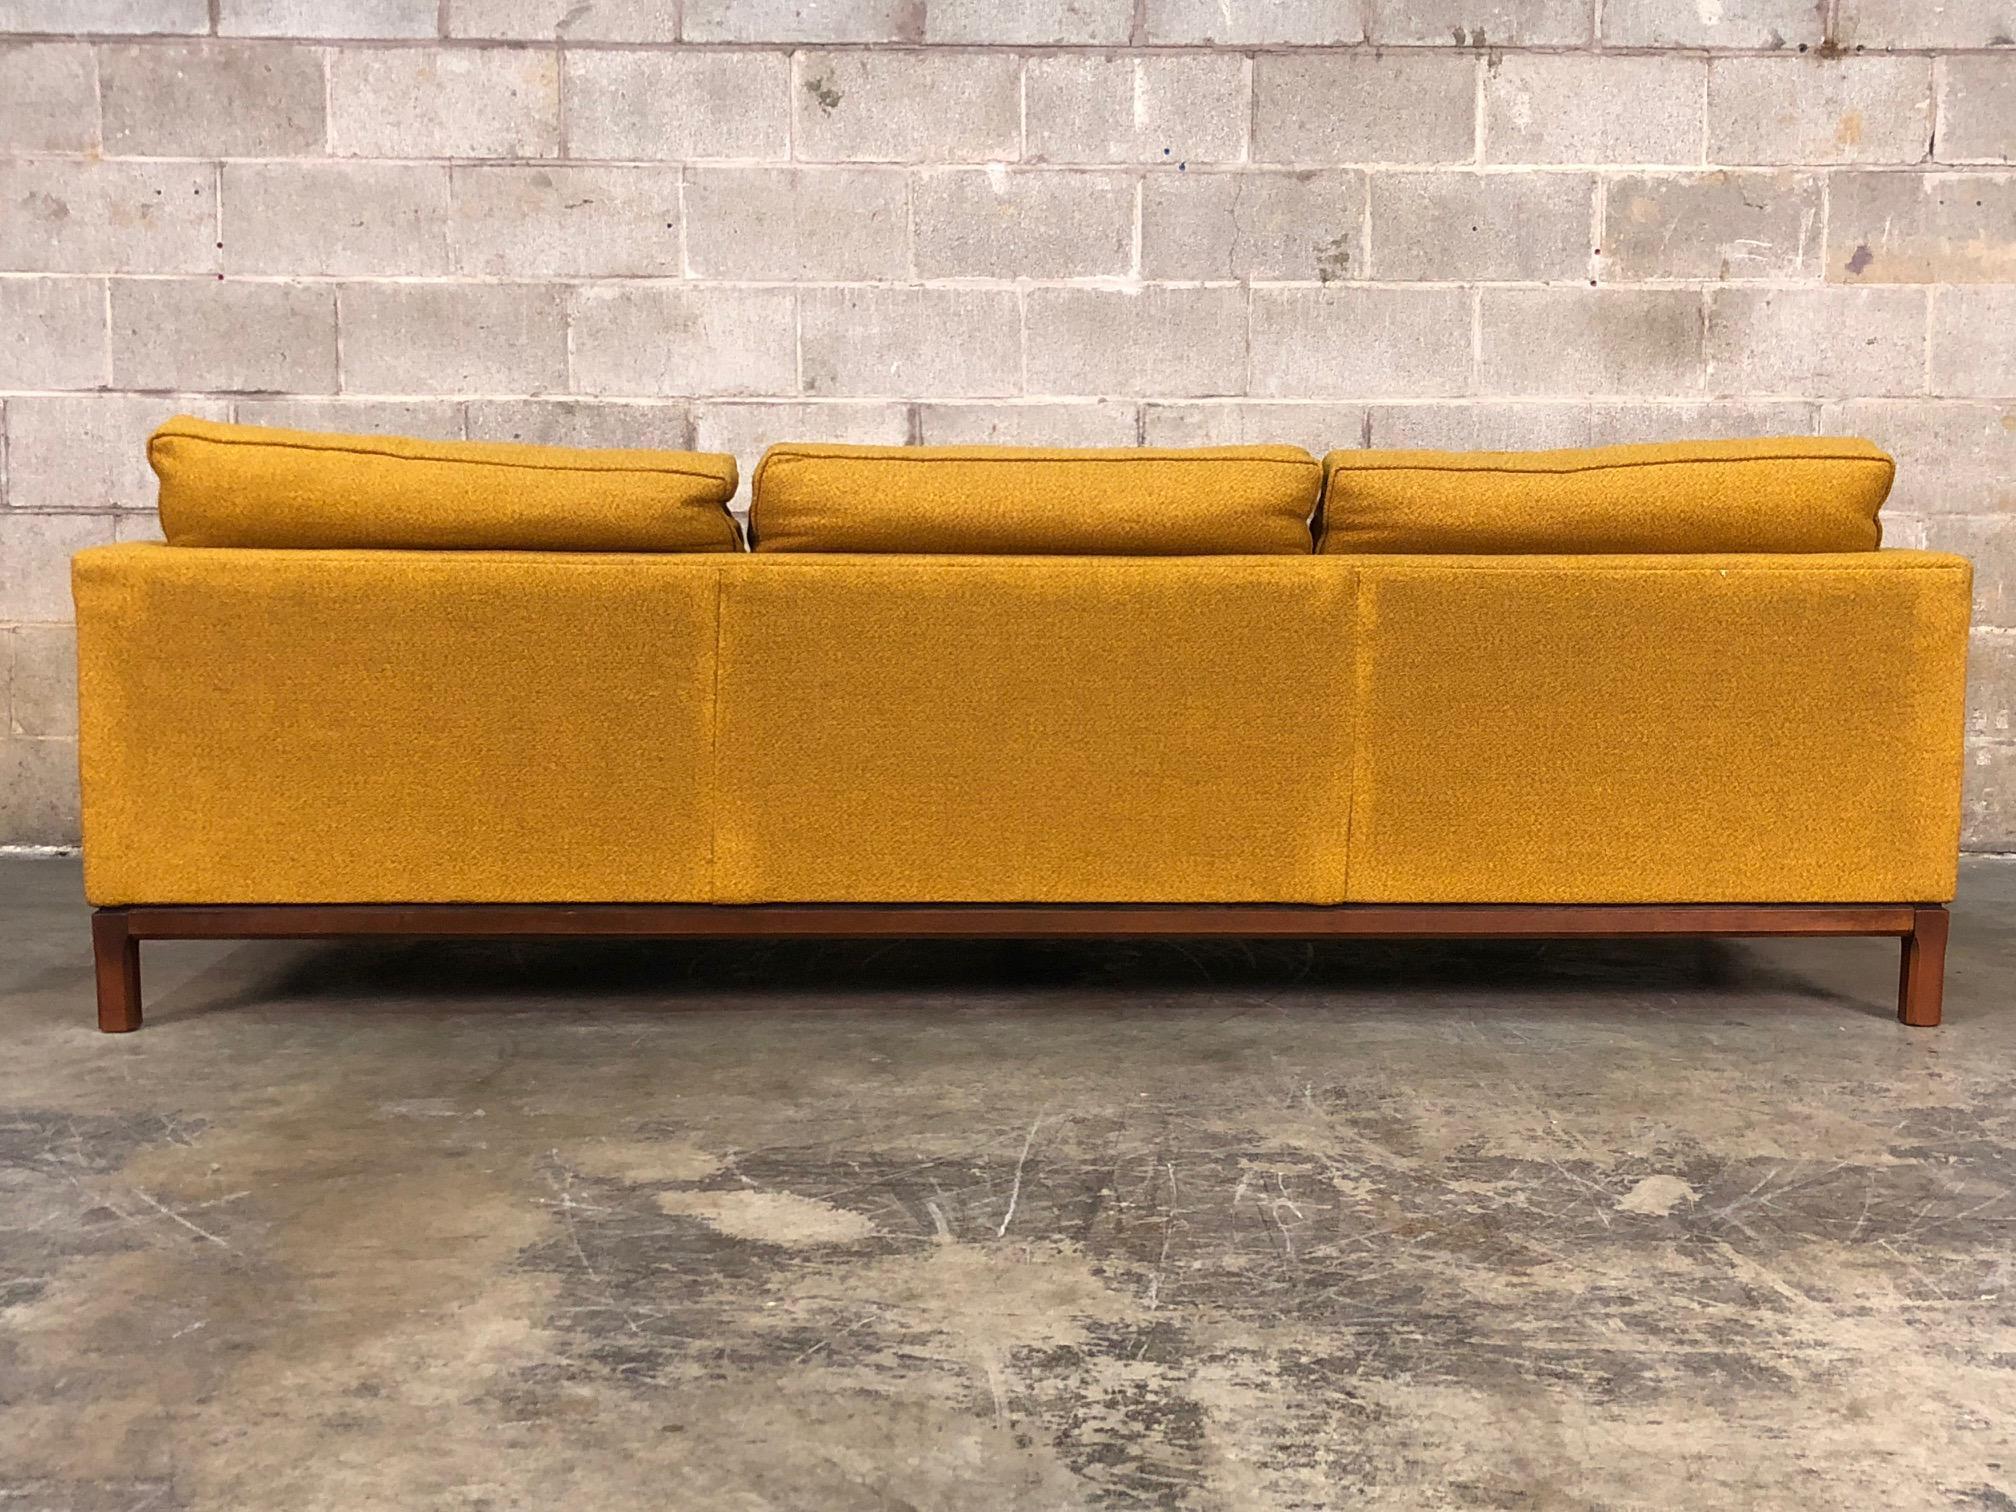 Rowe Gold Tweed Mid Century Modern Sofa For Sale In Saint Louis   Image 6